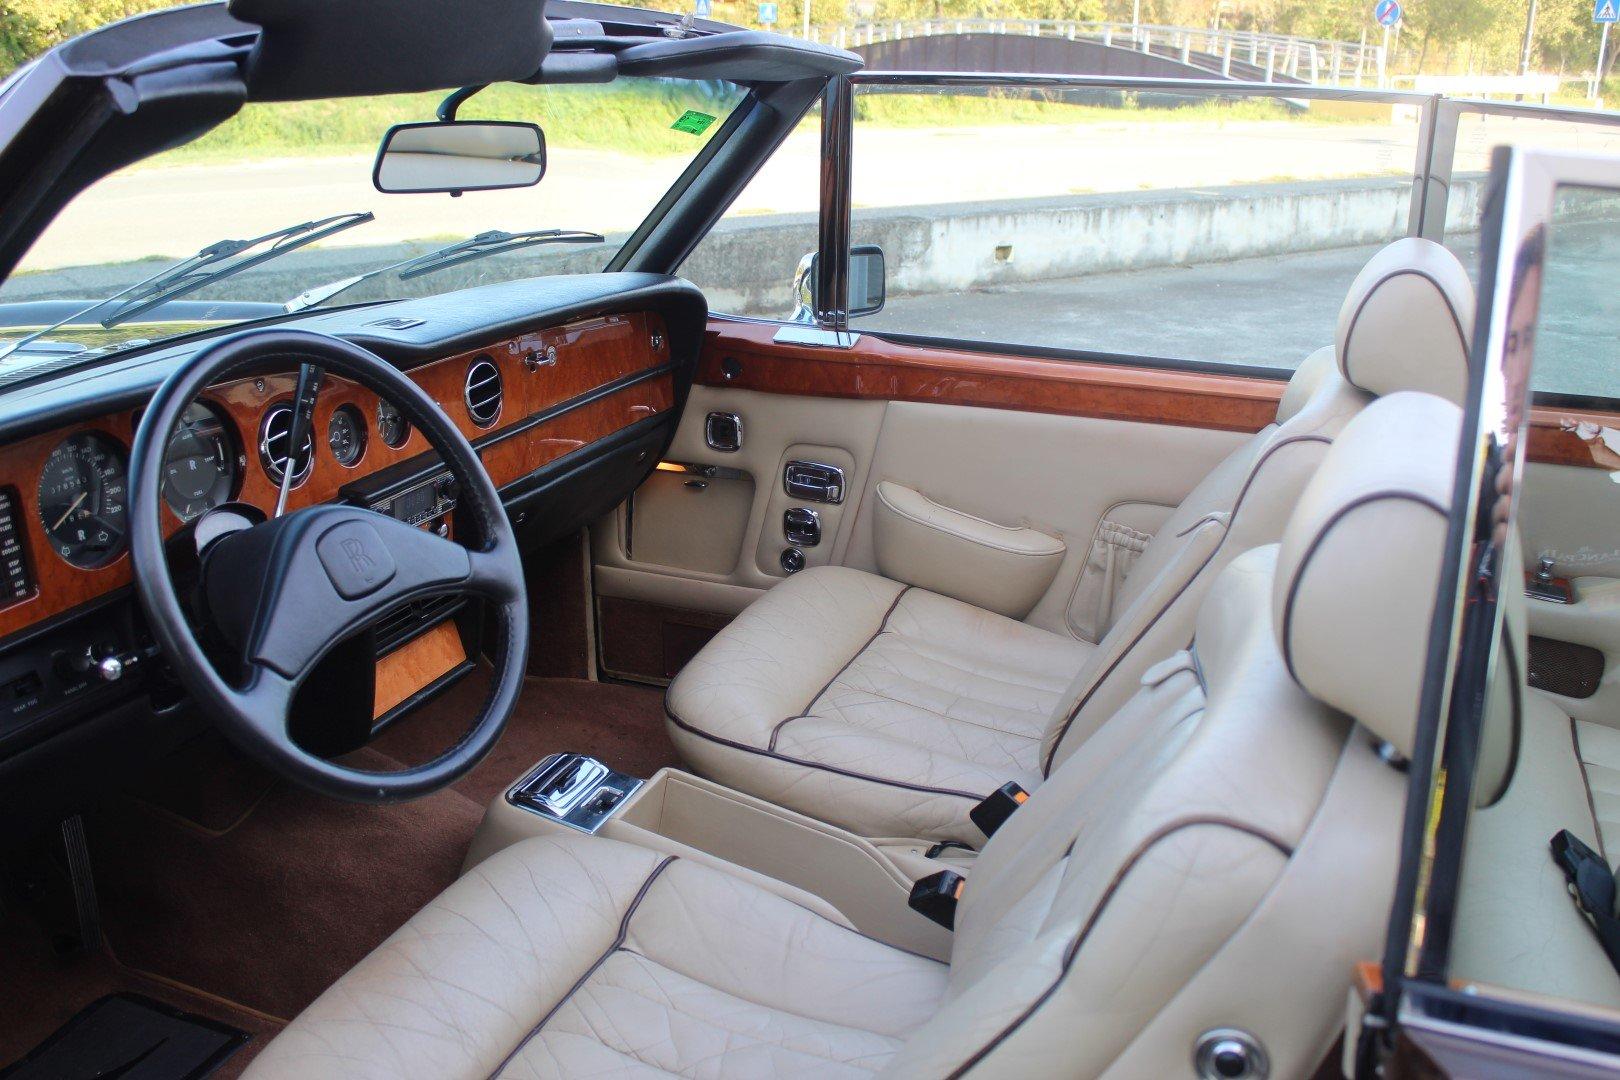 1977 Rolls royce corniche ii convertible lhd european For Sale (picture 4 of 6)